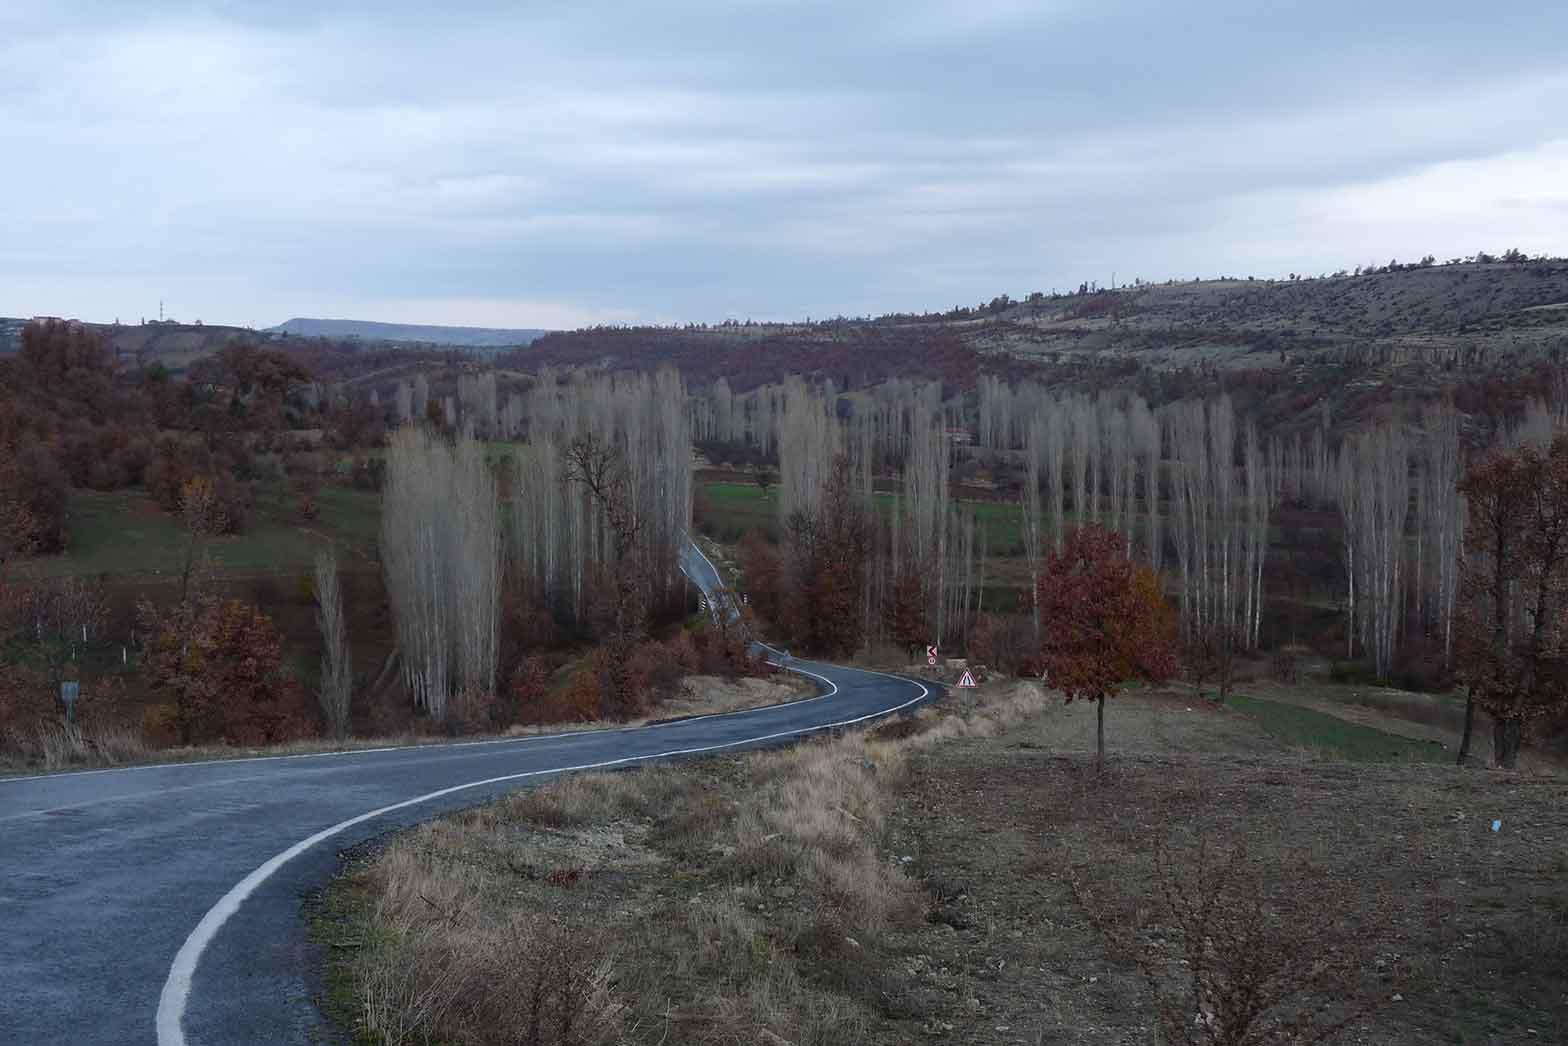 Turkish backcountry road